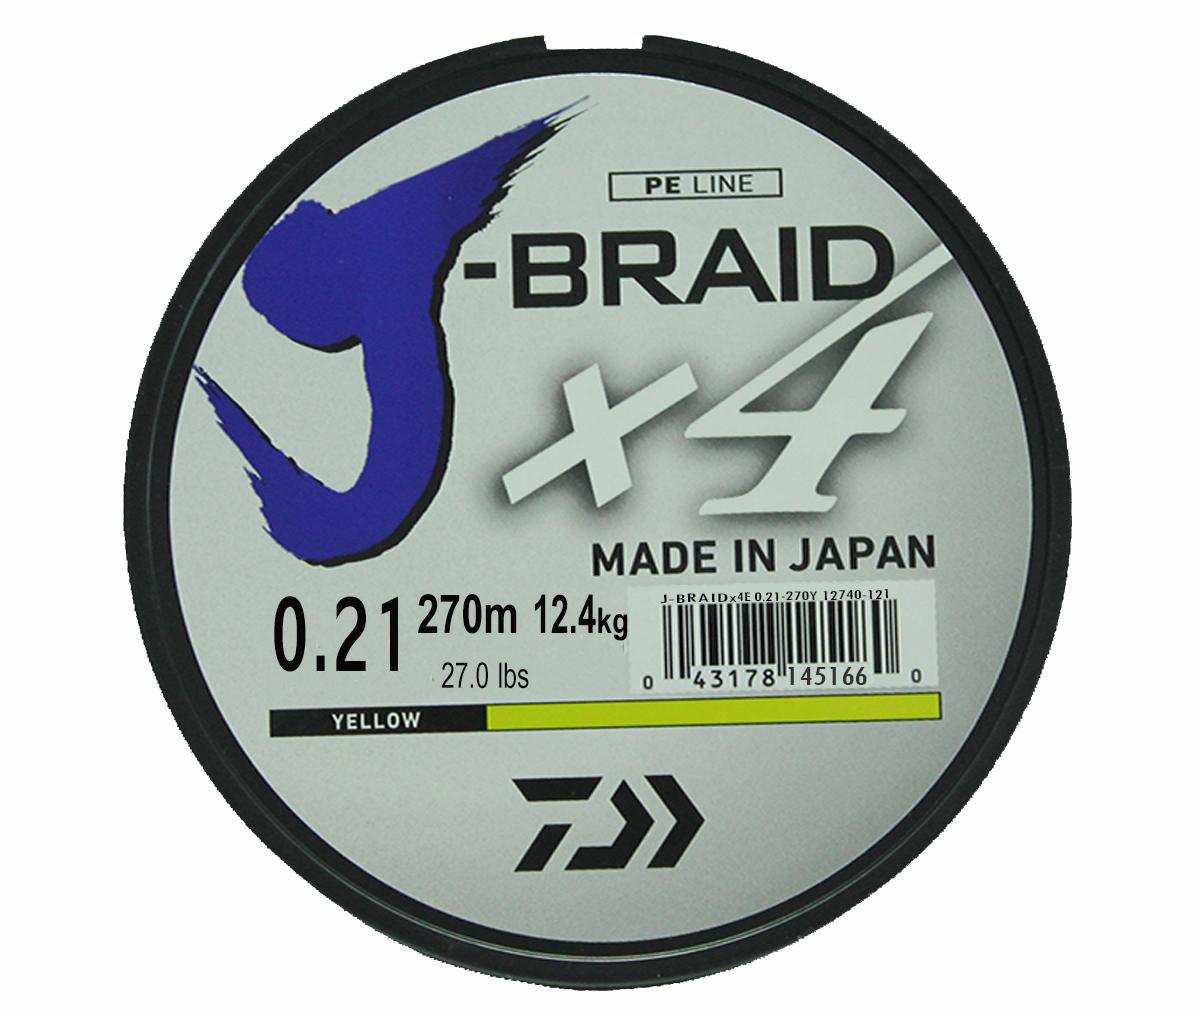 Шнур плетеный Daiwa J-Braid X4, цвет: флуоресцентный желтый, 270 м, 0,21 мм